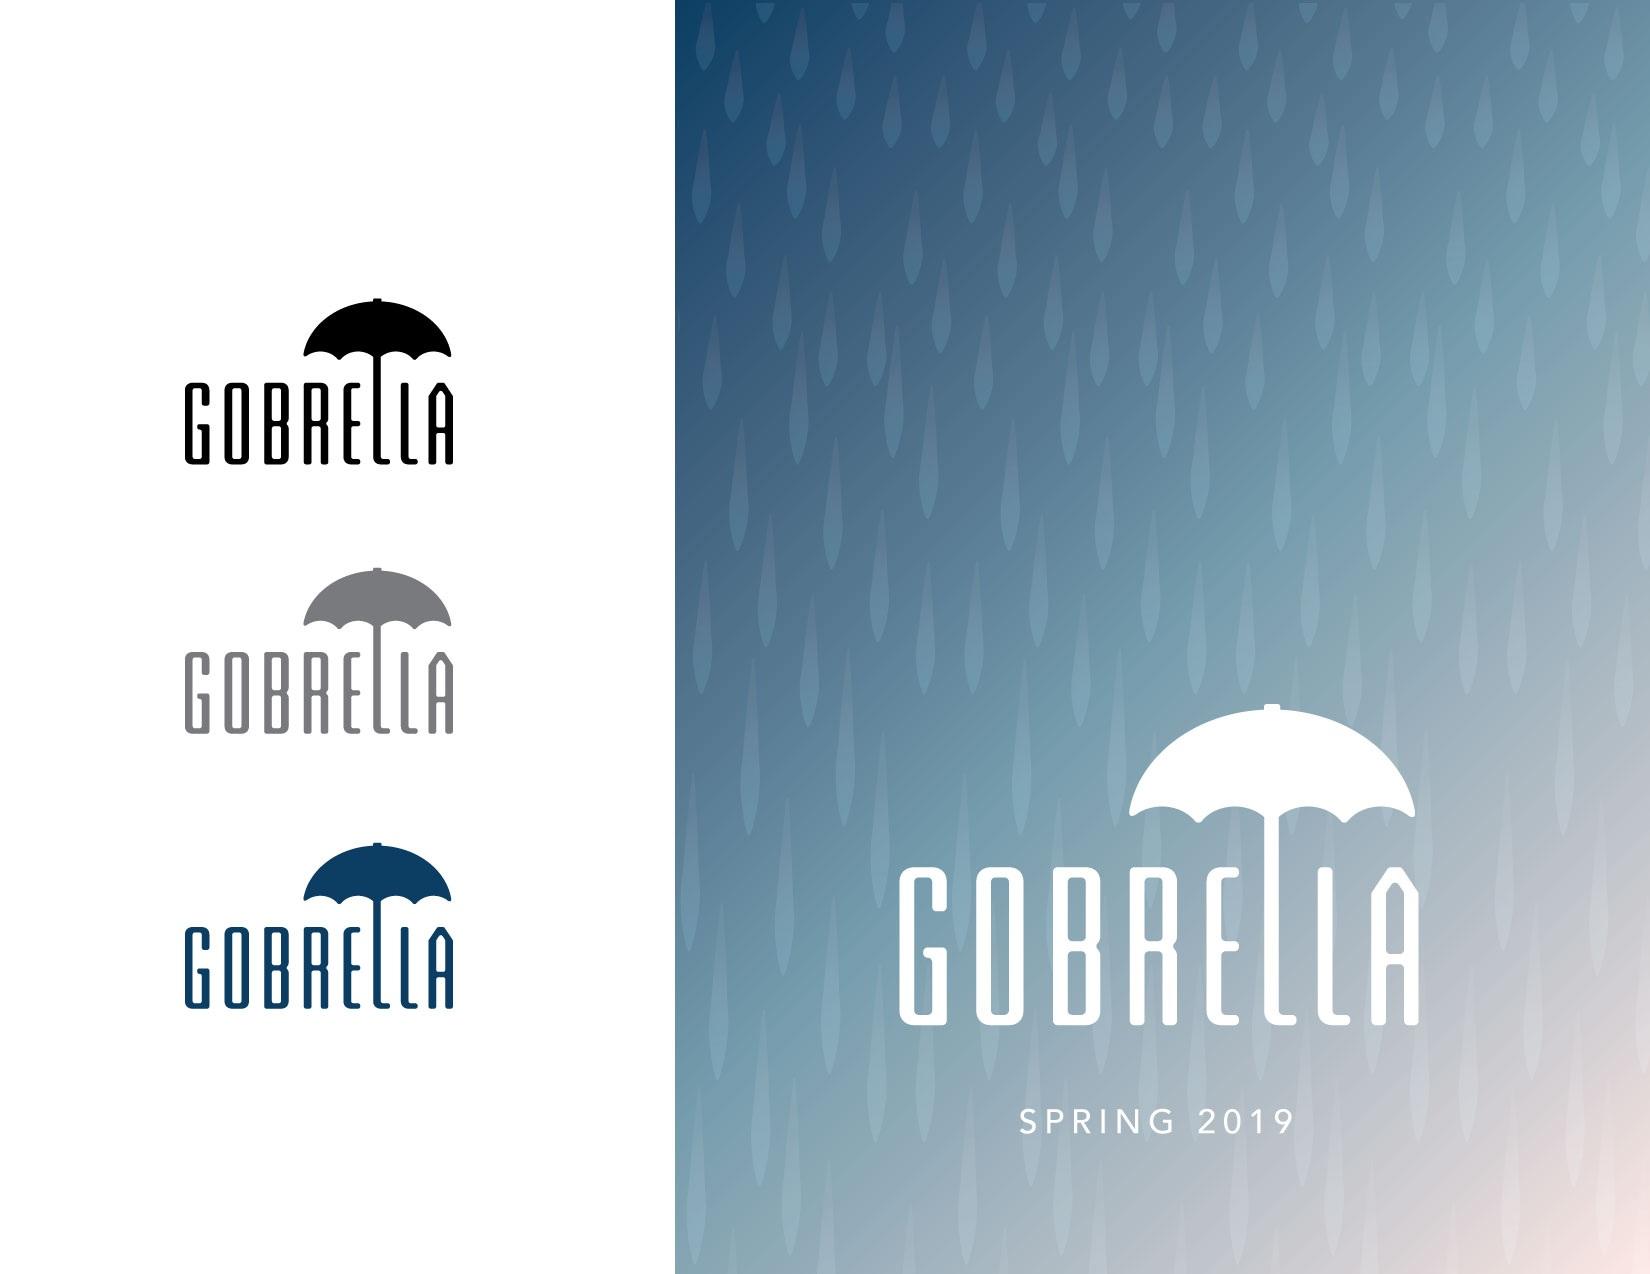 GOBRELLA_FINAL-01.jpg